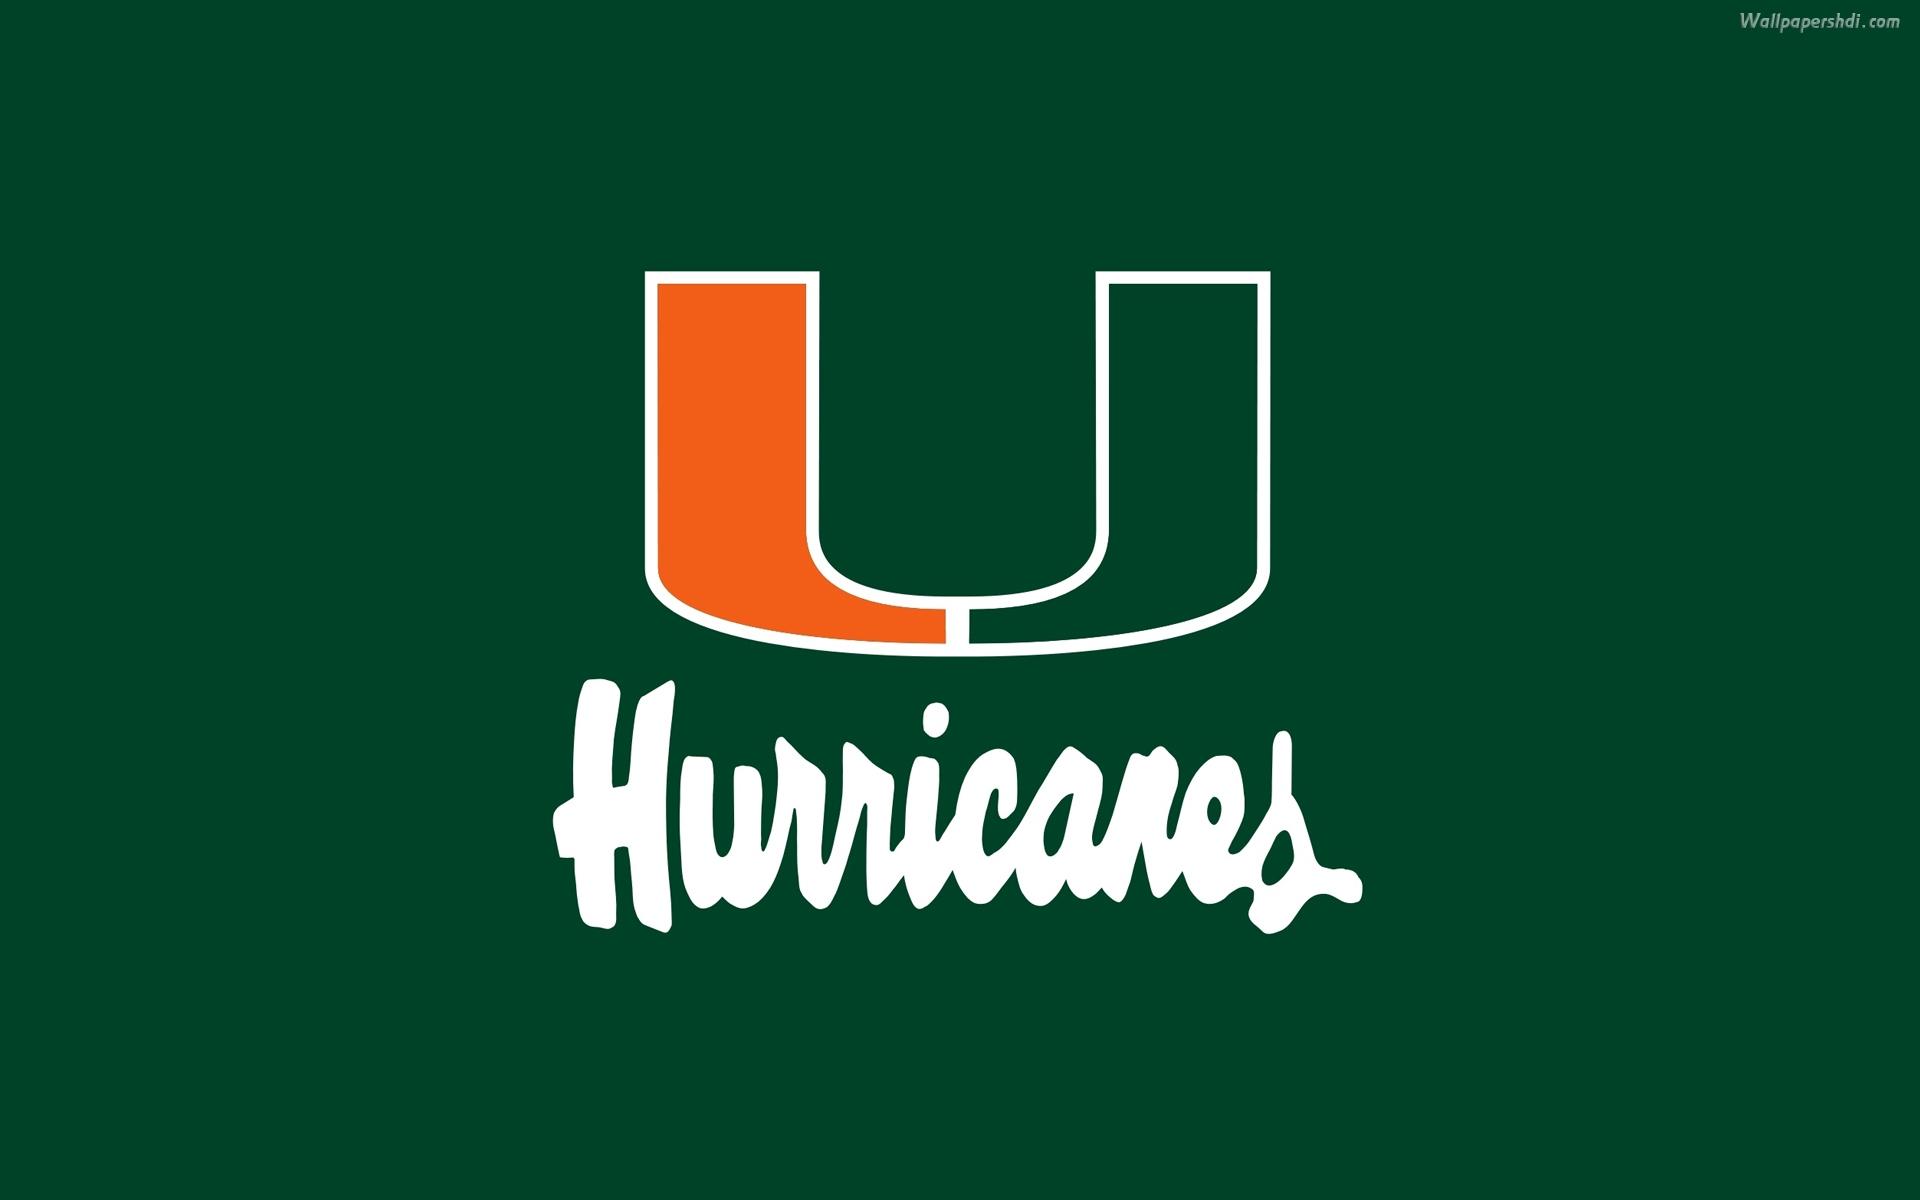 Miami Hurricanes Football Wallpaper - http://wallpaperzoo com